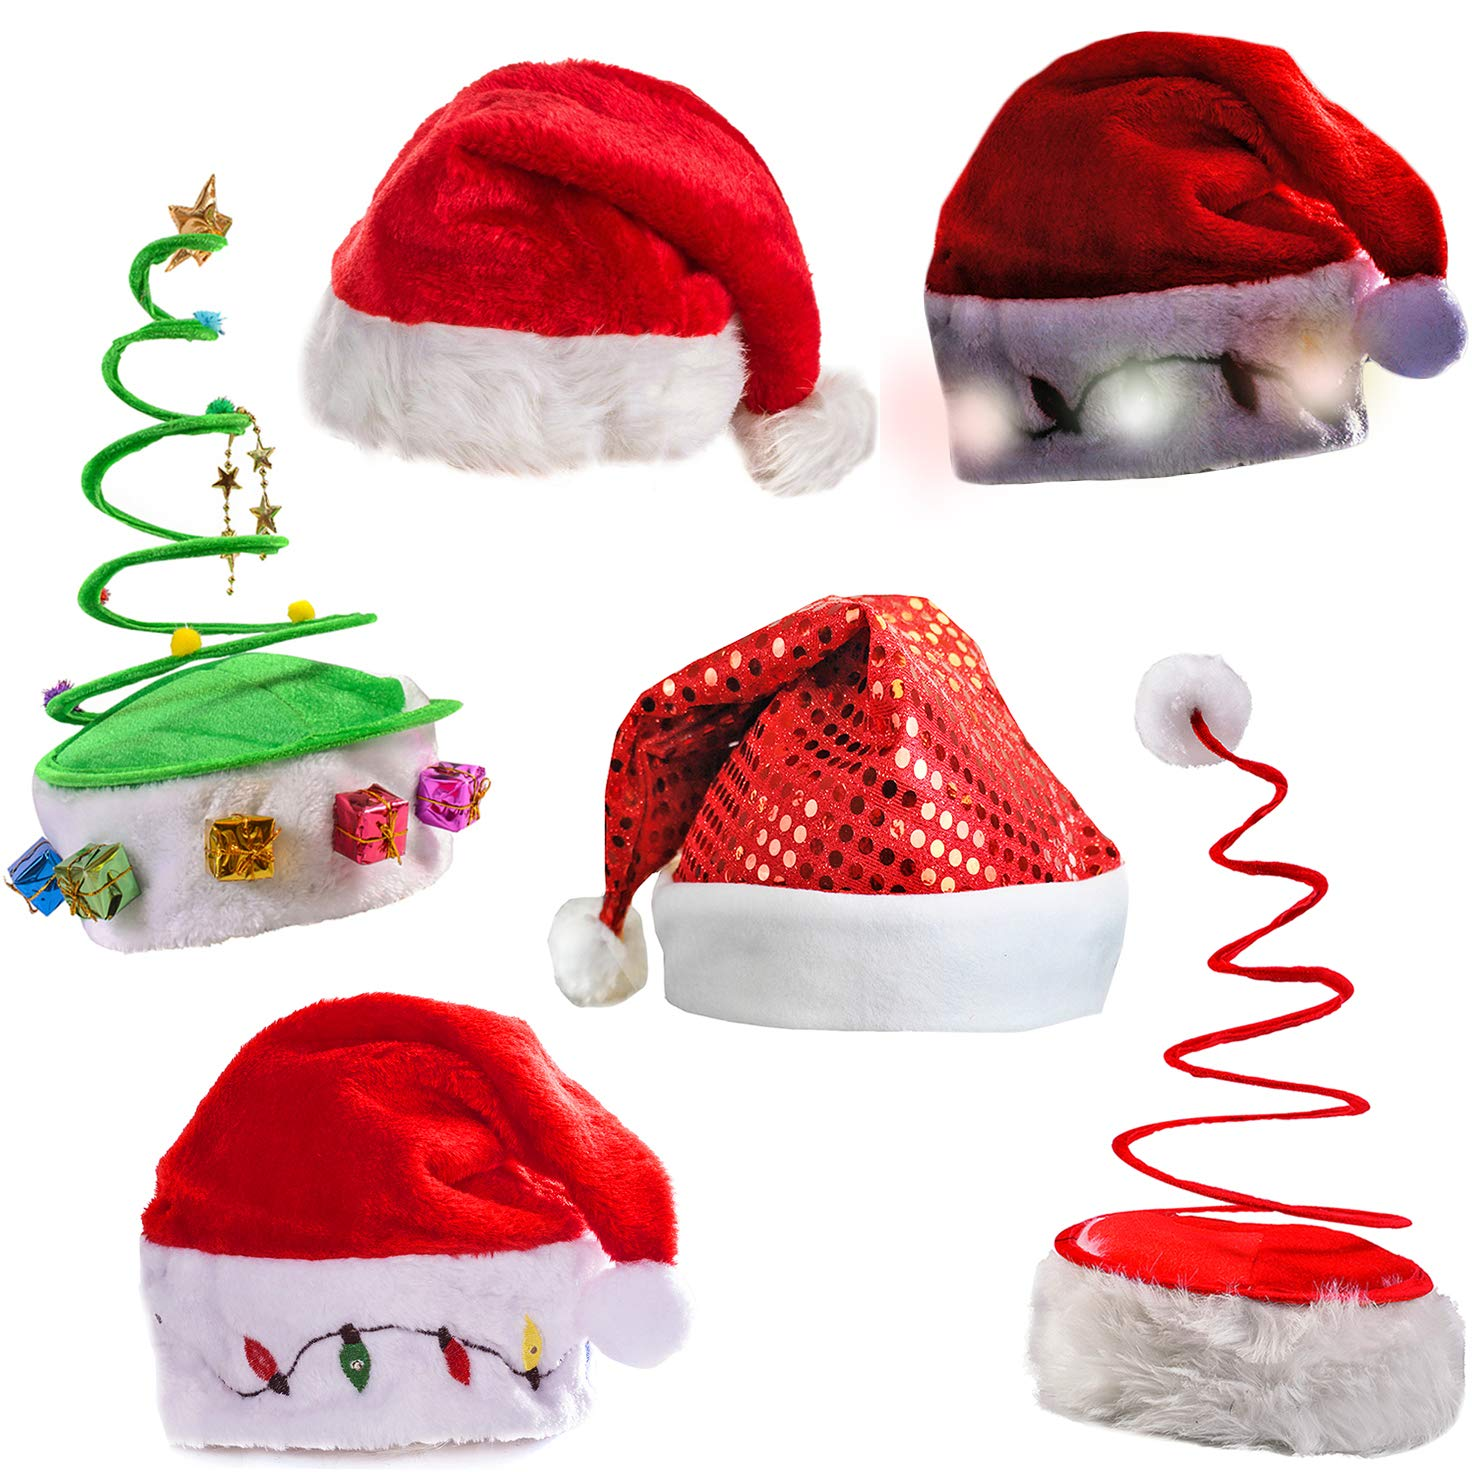 58989e3e4b1 Amazon.com  Funny Party Hats Christmas Hats - Santa Hat